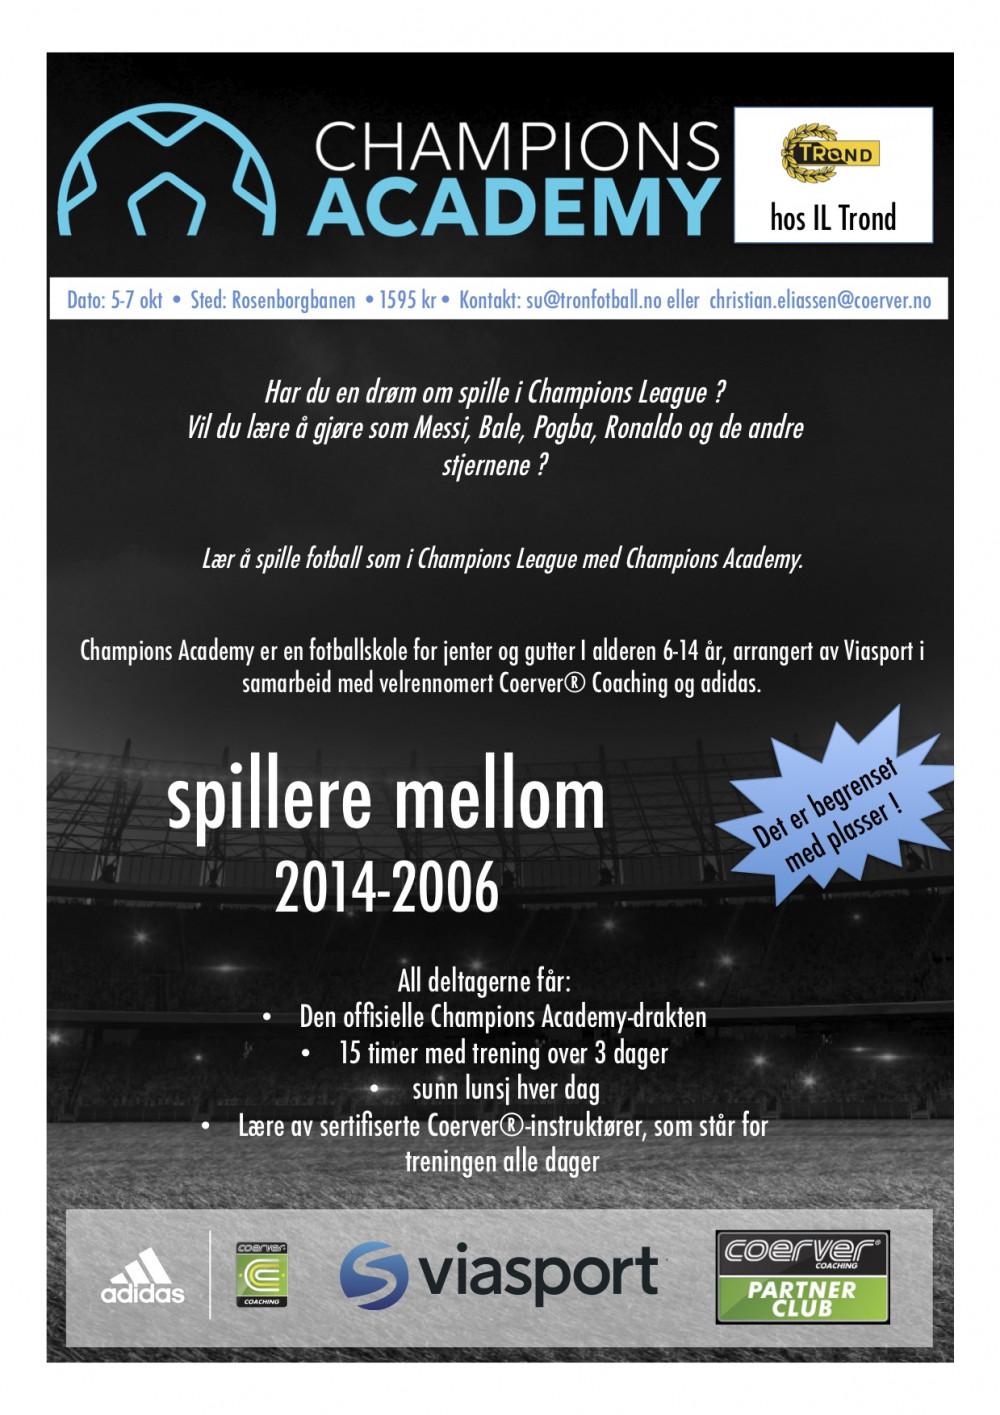 Champions Academy hos IL Trond 2020